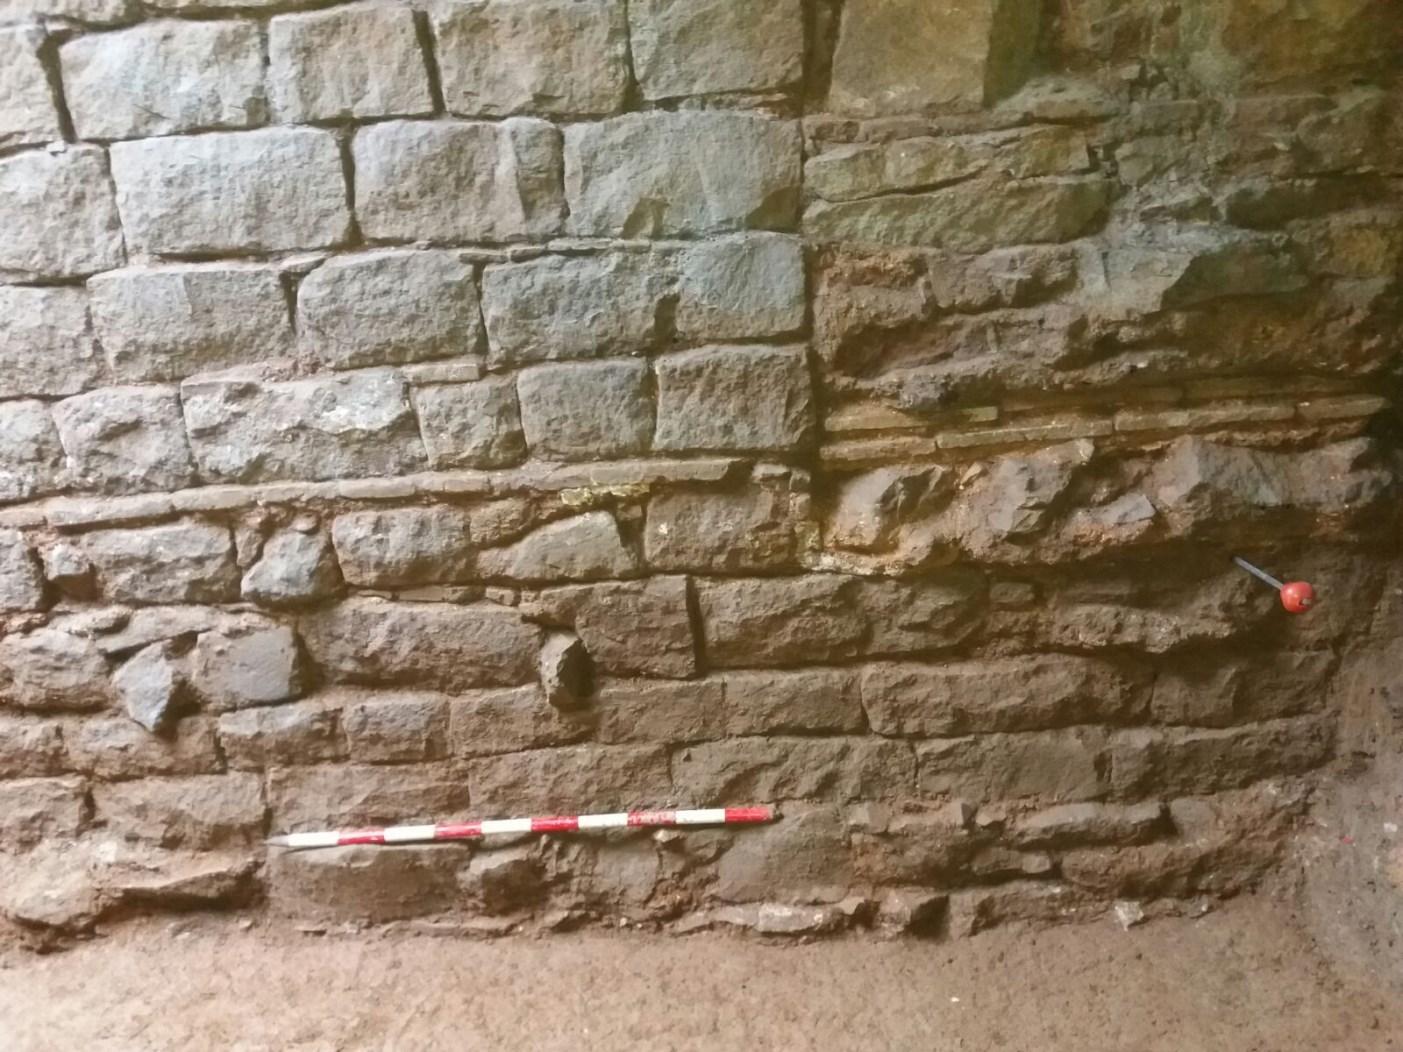 Mur de façana medieval amb reformes modernes. Foto: Esteve Nadal (Actium)